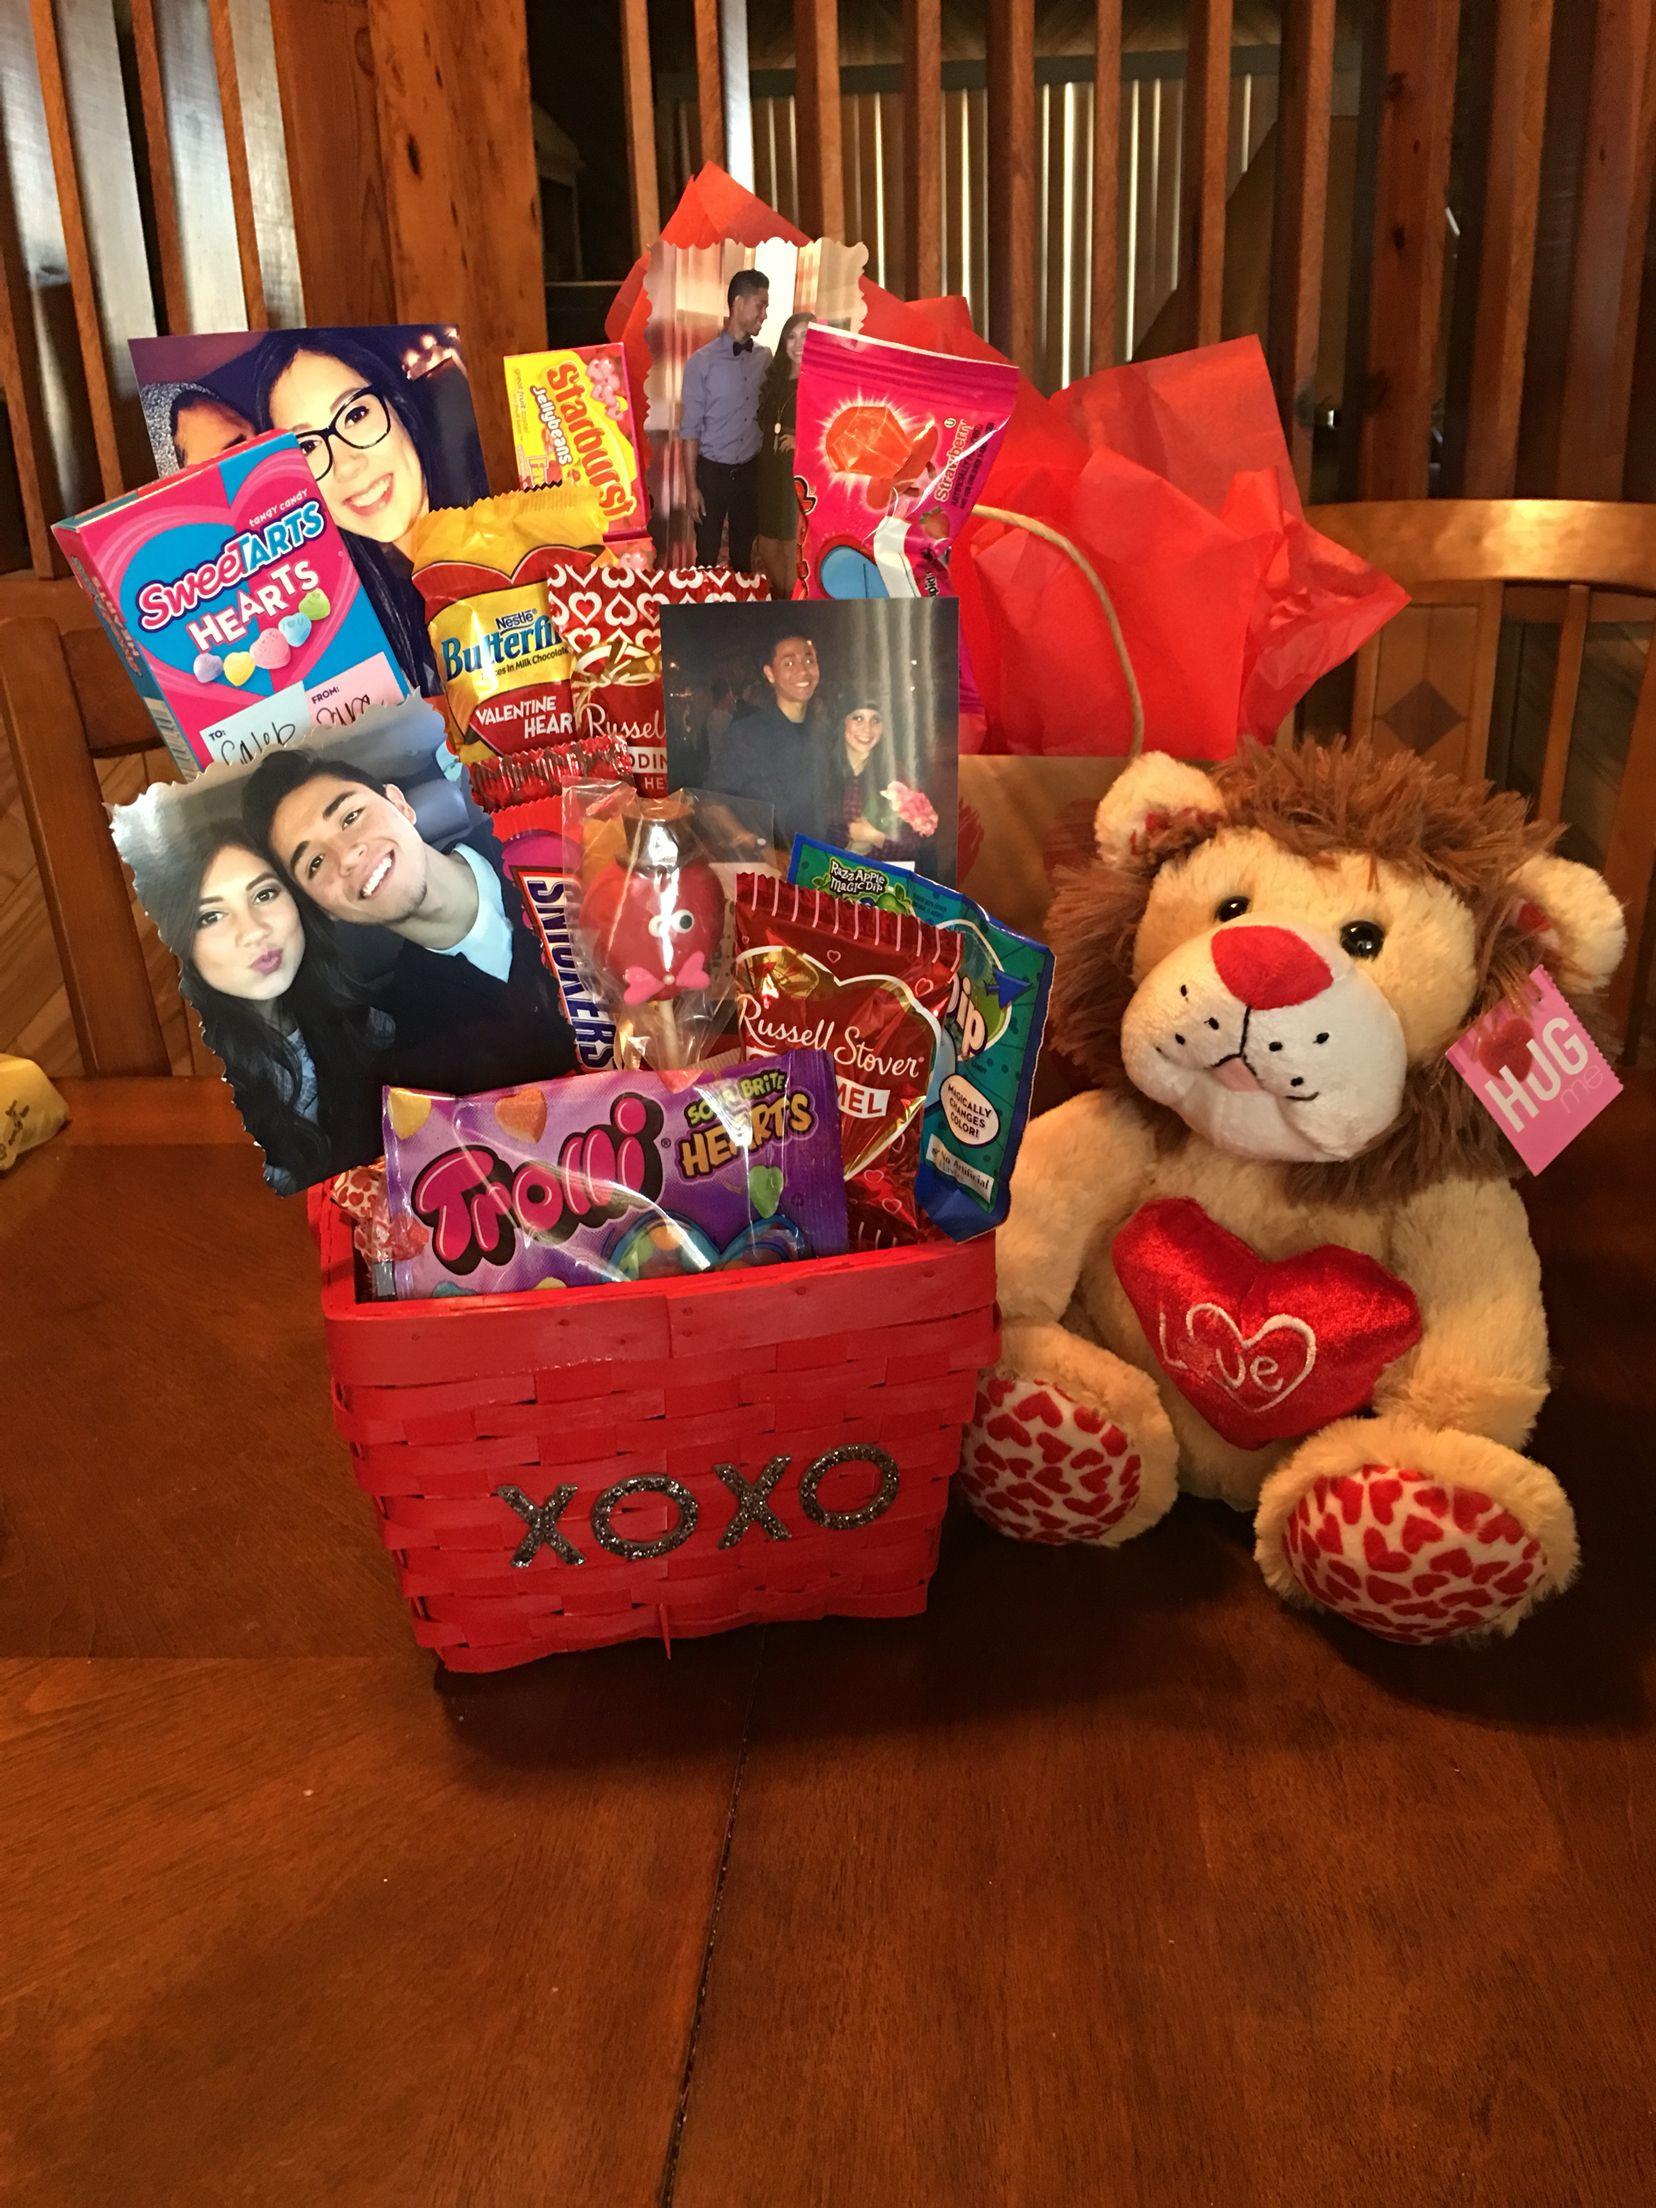 Cute Sentimental Gift Ideas For Boyfriend  Valentine s Day t for him ️ ️ ️